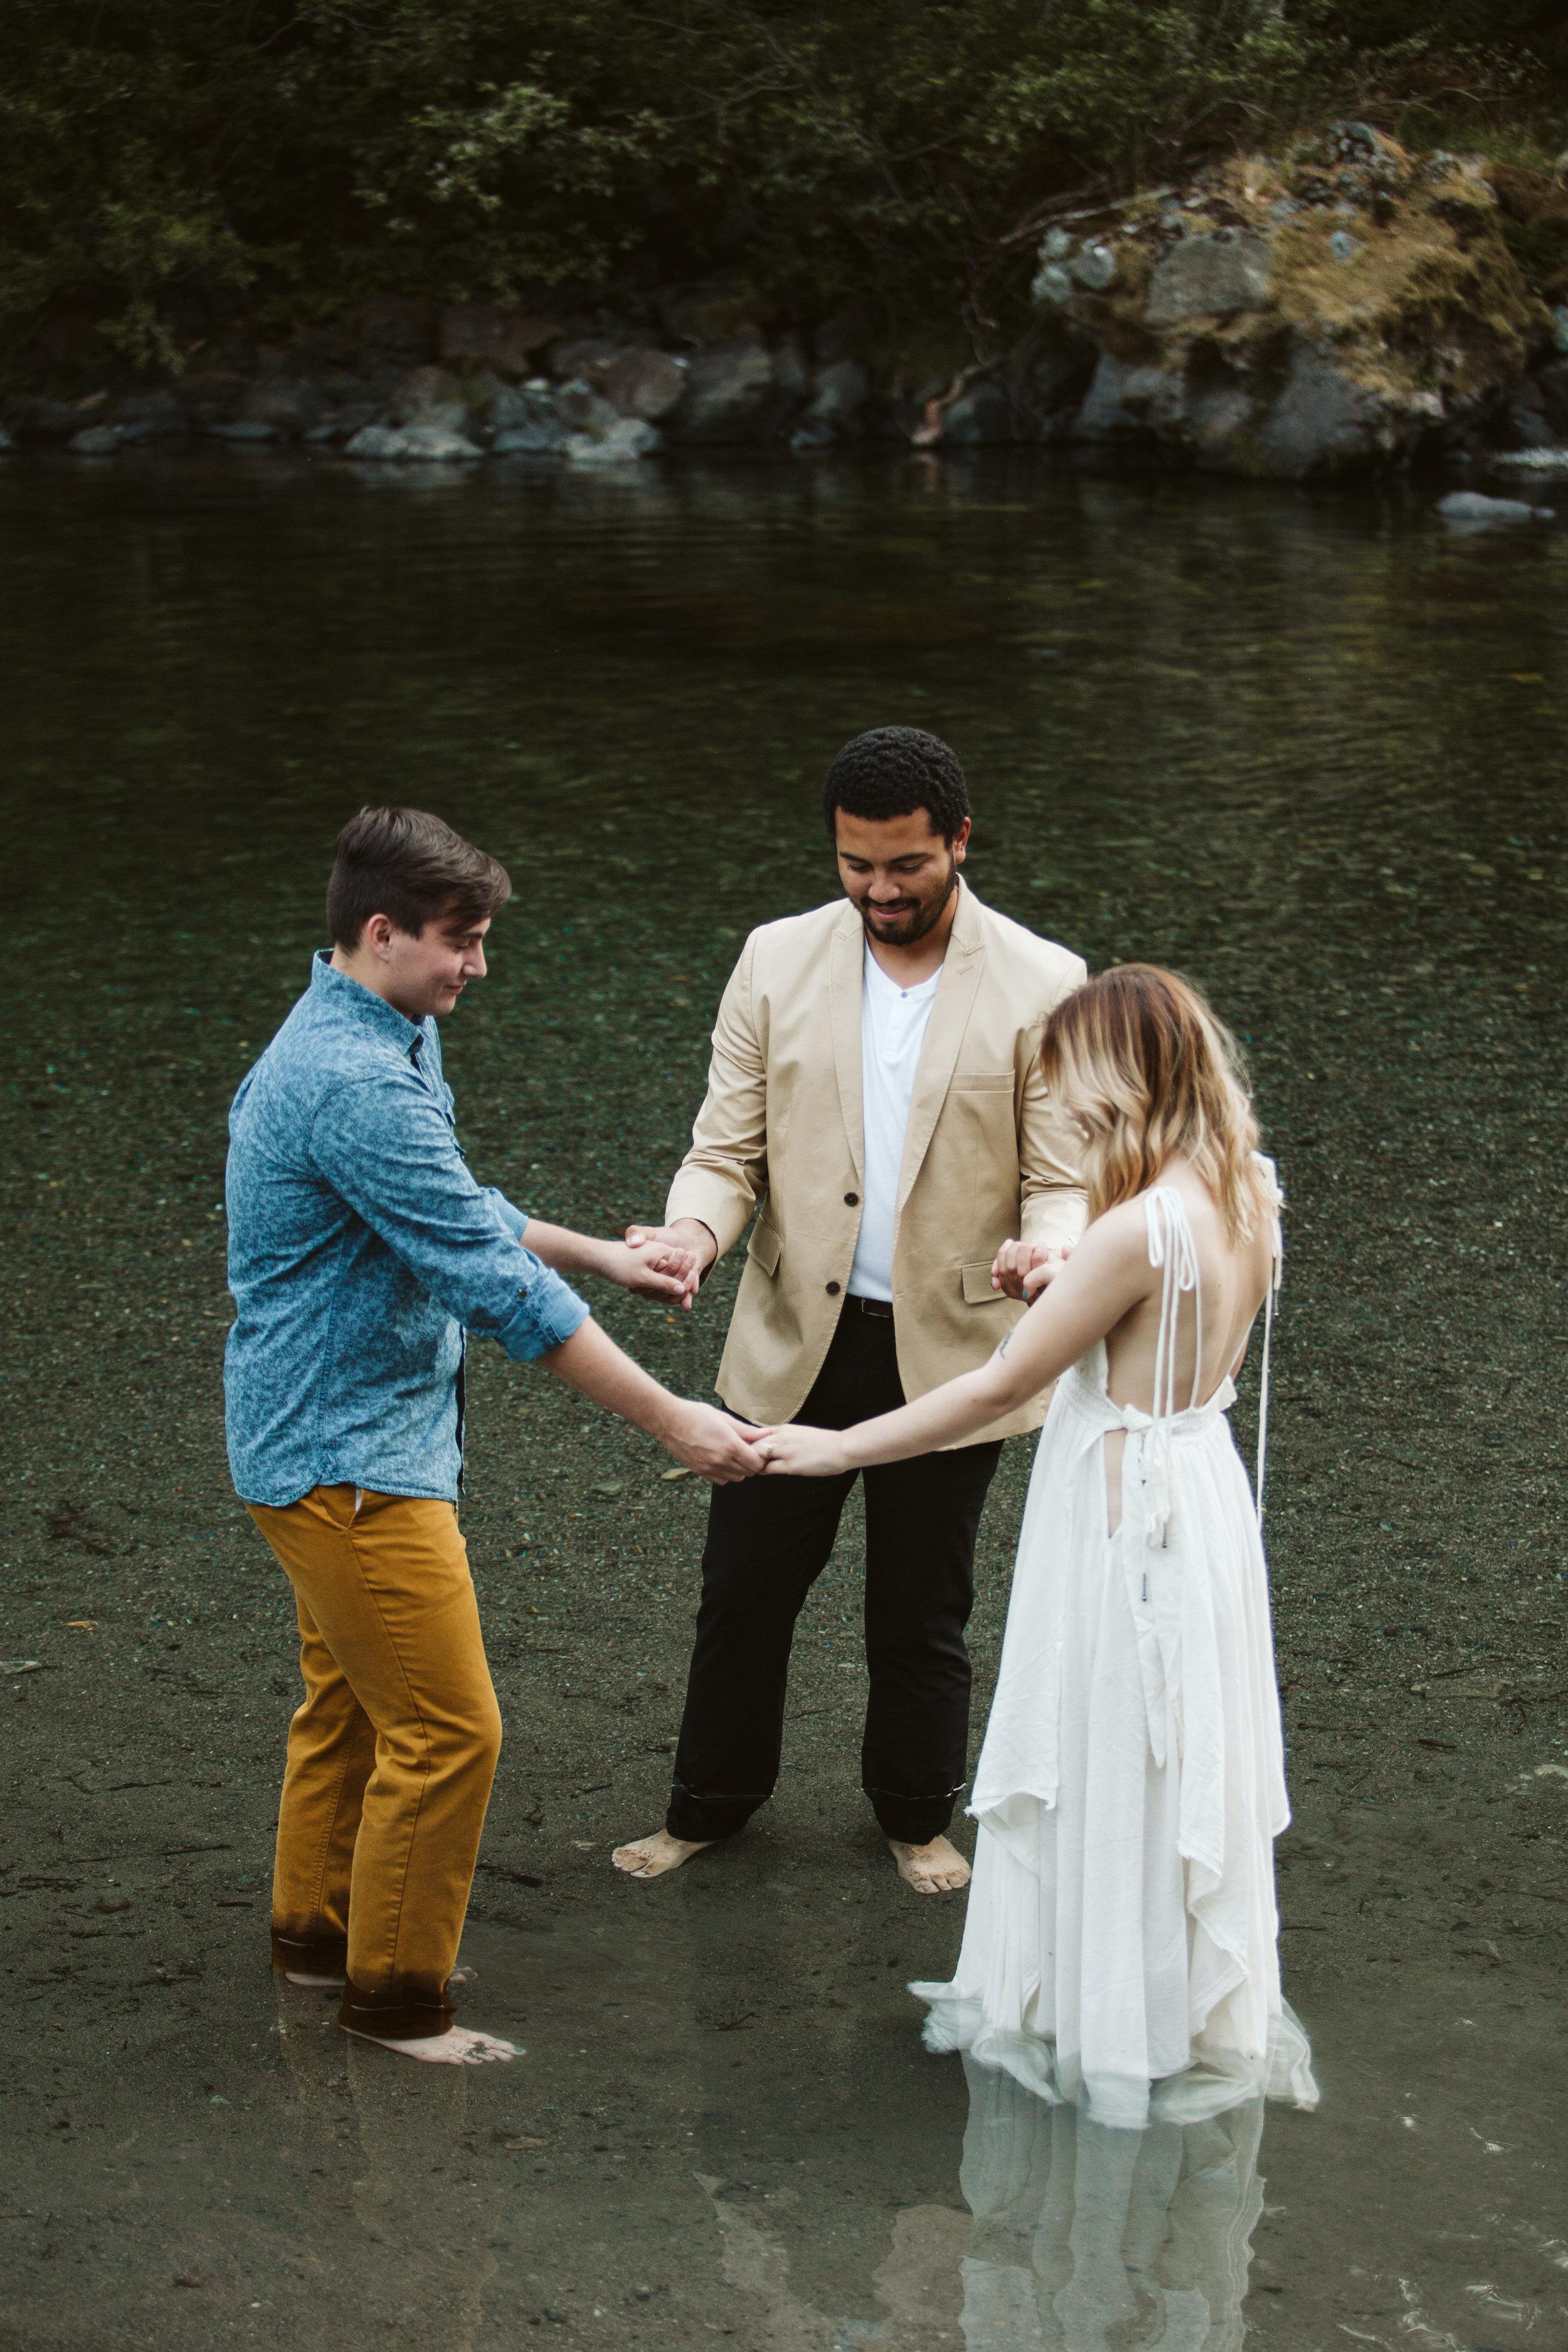 Hannah&Ben_Redwoods_Elopement_Engagement_PNW_SouthernOregon_NorthernCalifornia_ (21 of 23).jpg